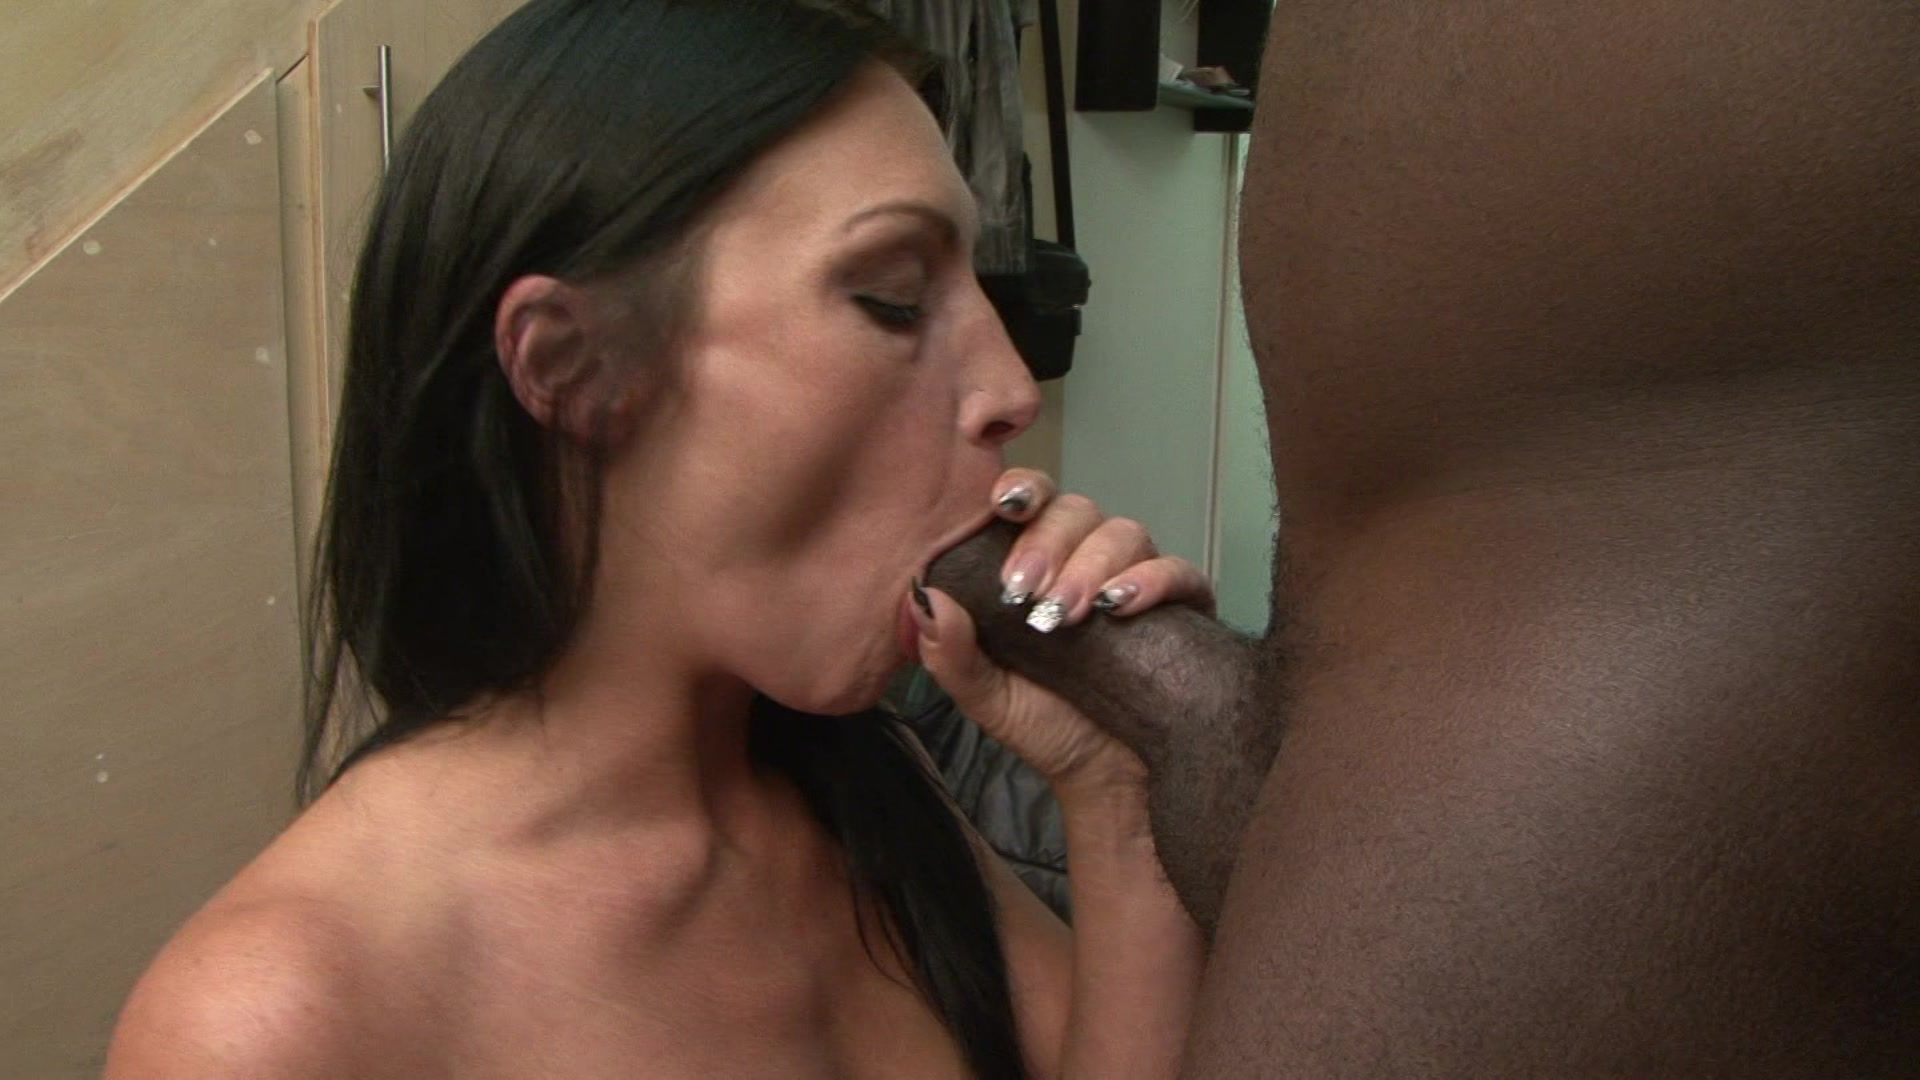 French Milf Sex Tube